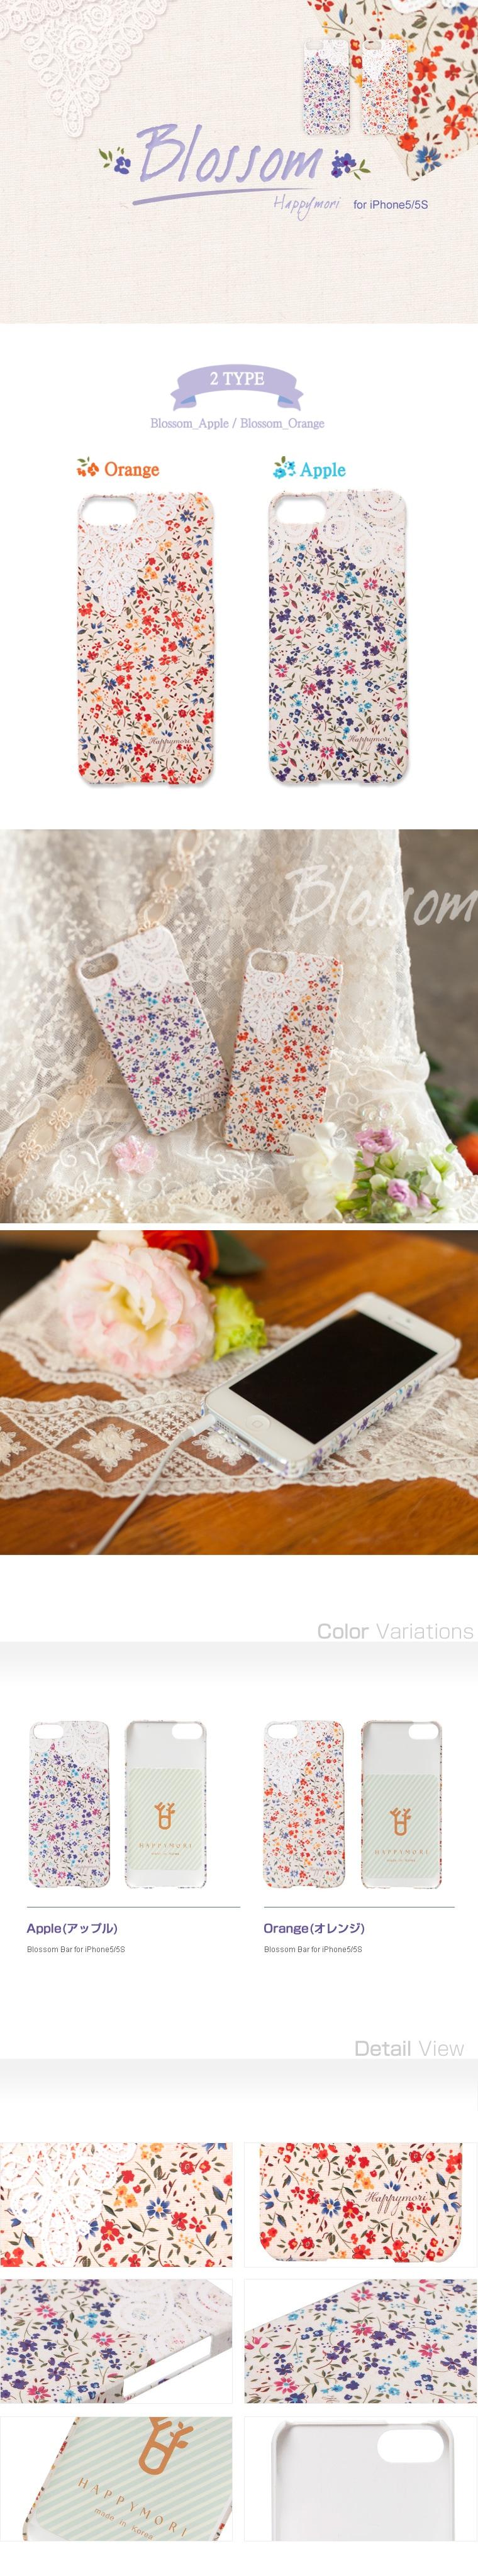 Happymori iPhone5S/5 Blossom Bar (ブロッサムバー)